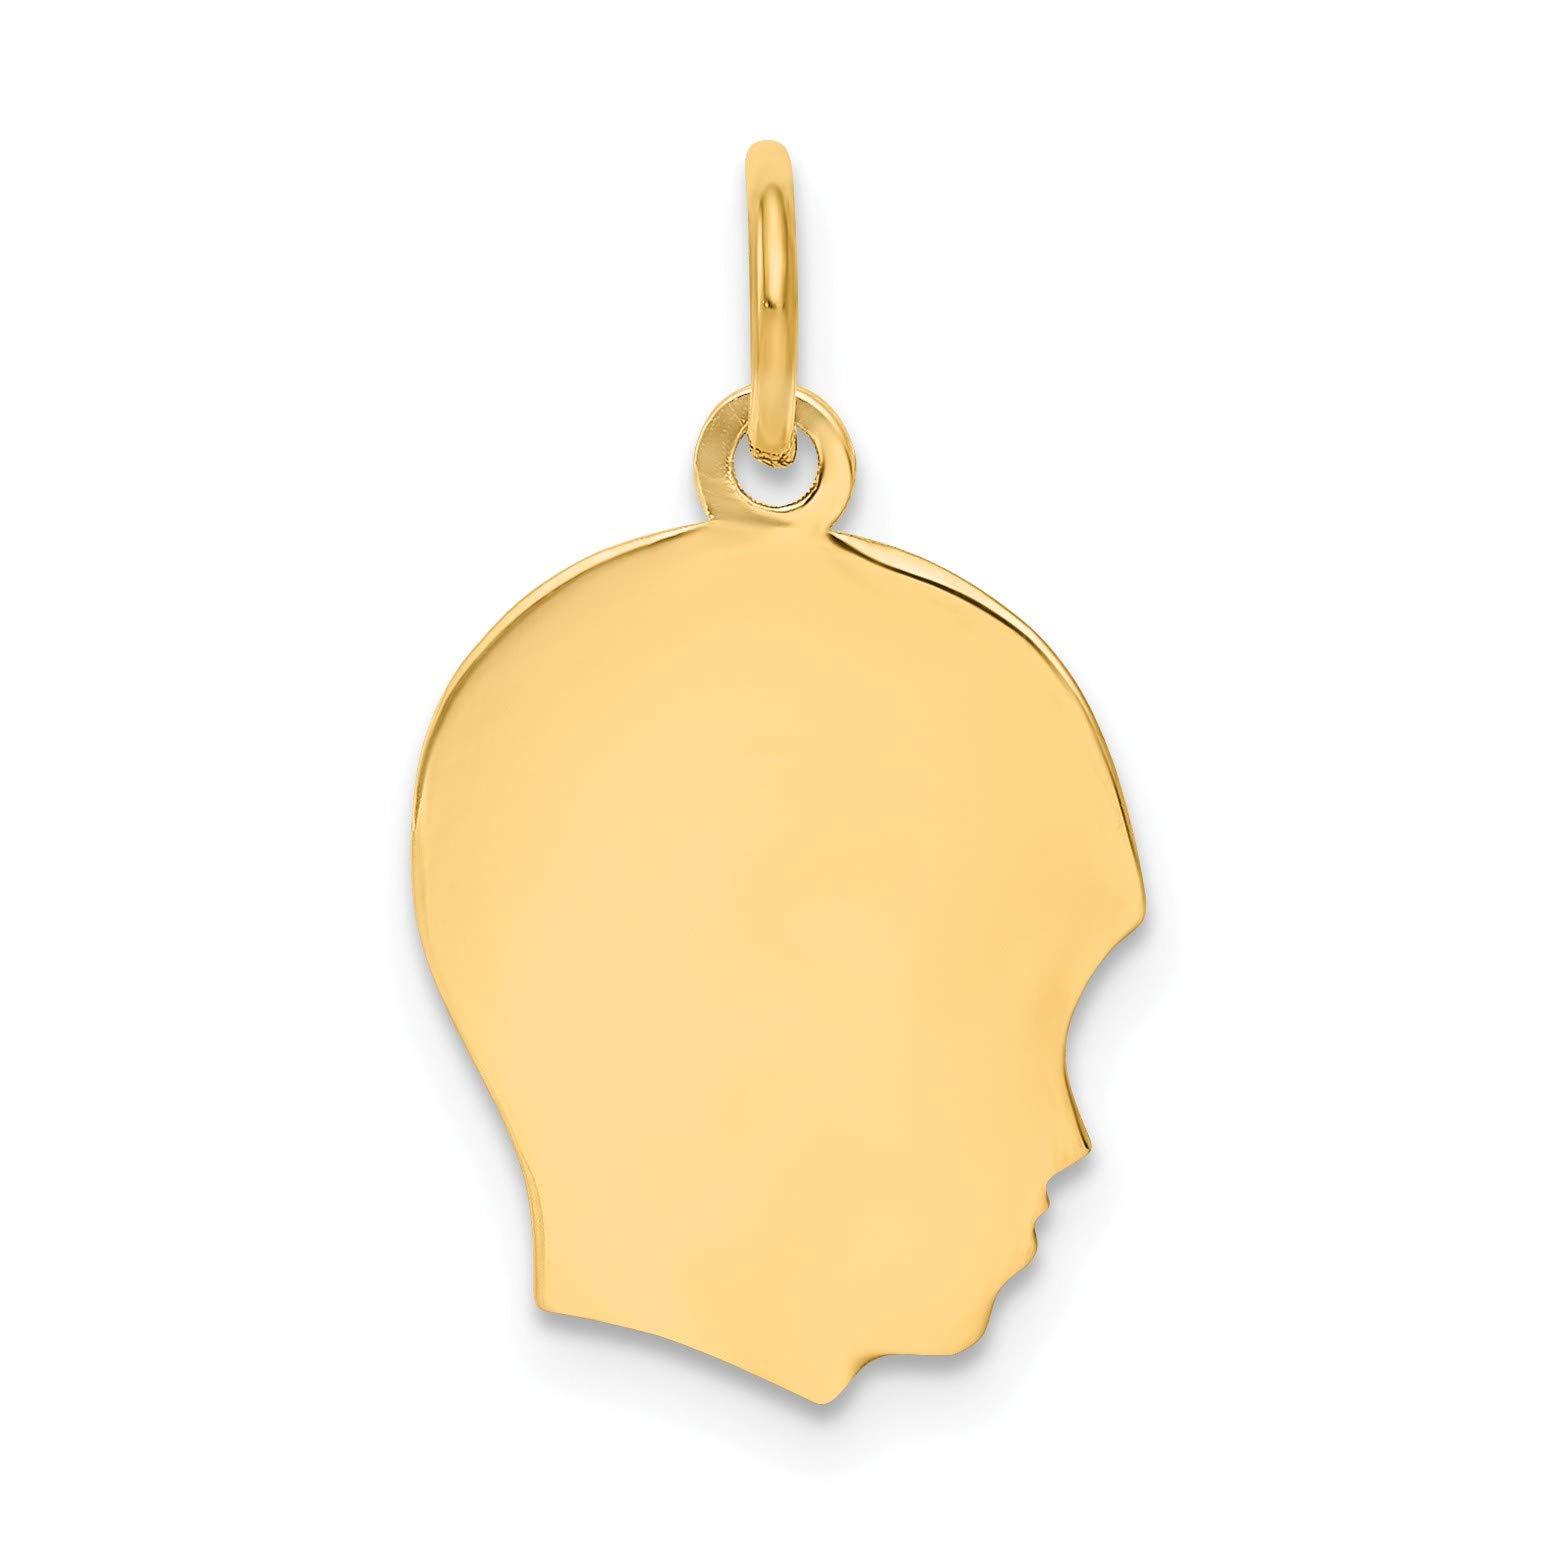 Bonyak Jewelry 10K Plain Medium .018 Gauge Facing Right Engravable Boy Head Charm in 10k Yellow Gold